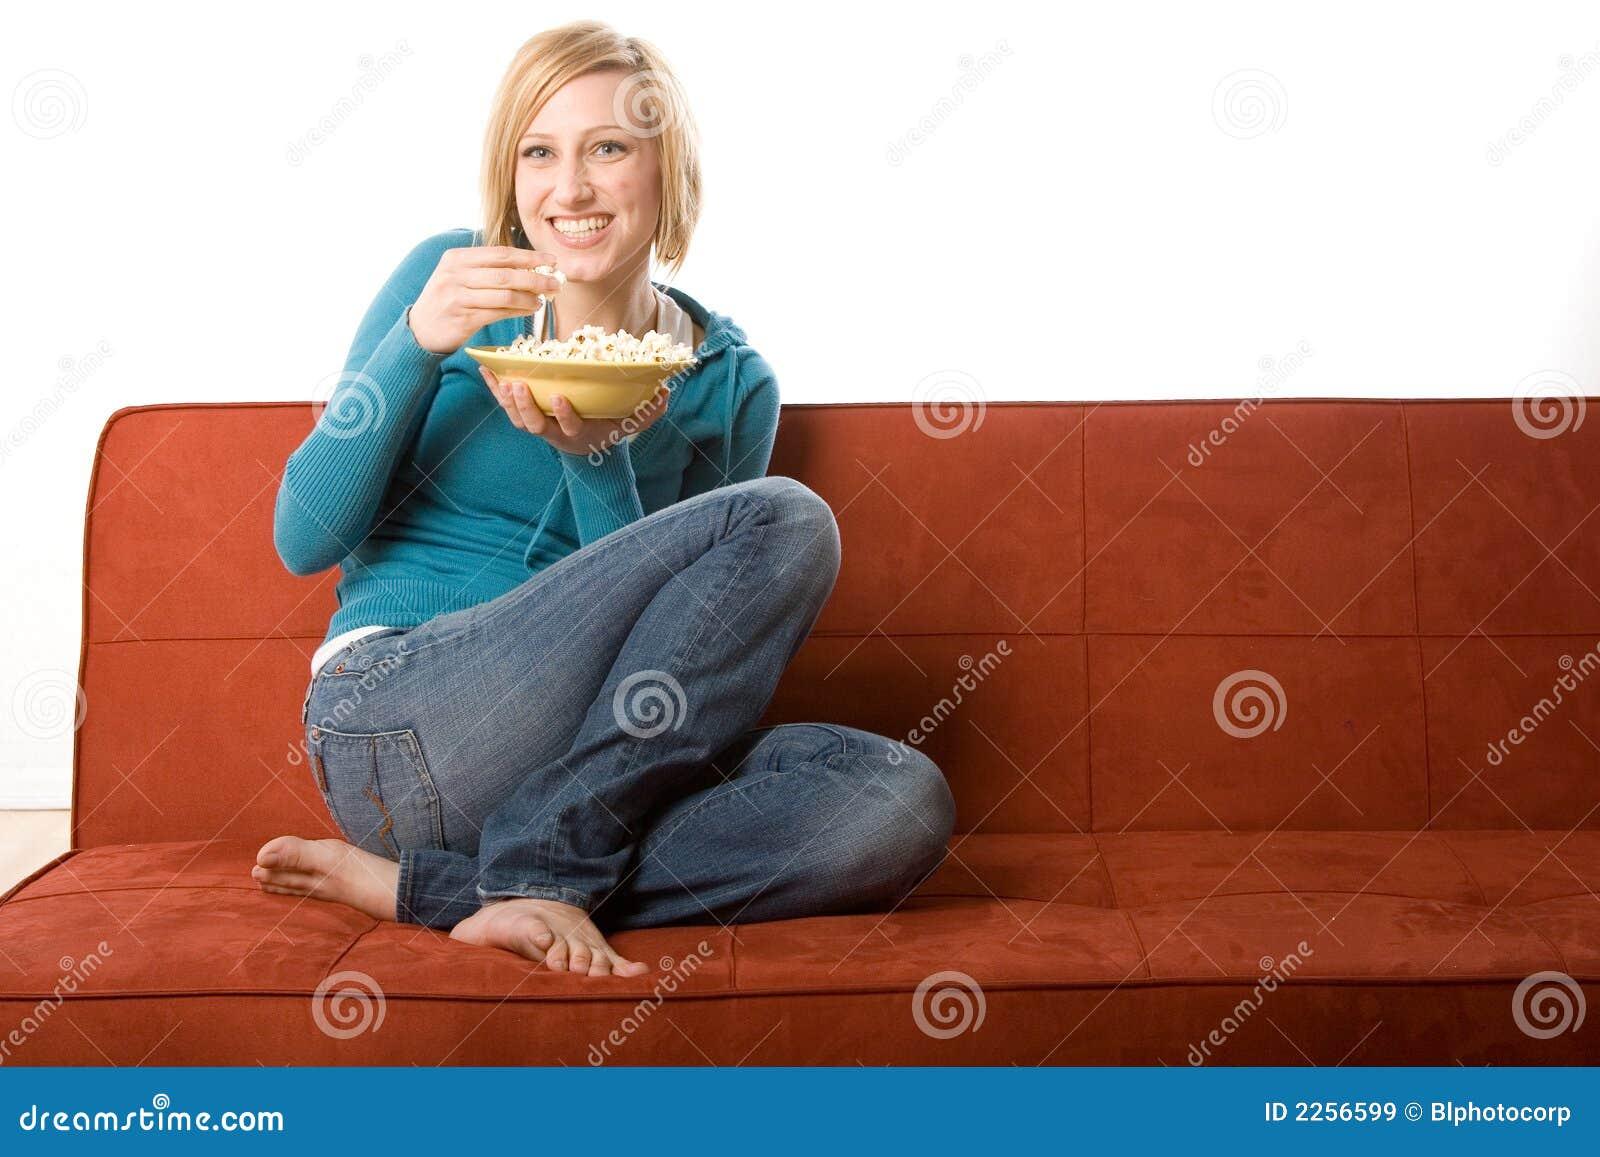 Junge erwachsene Frau auf Couch